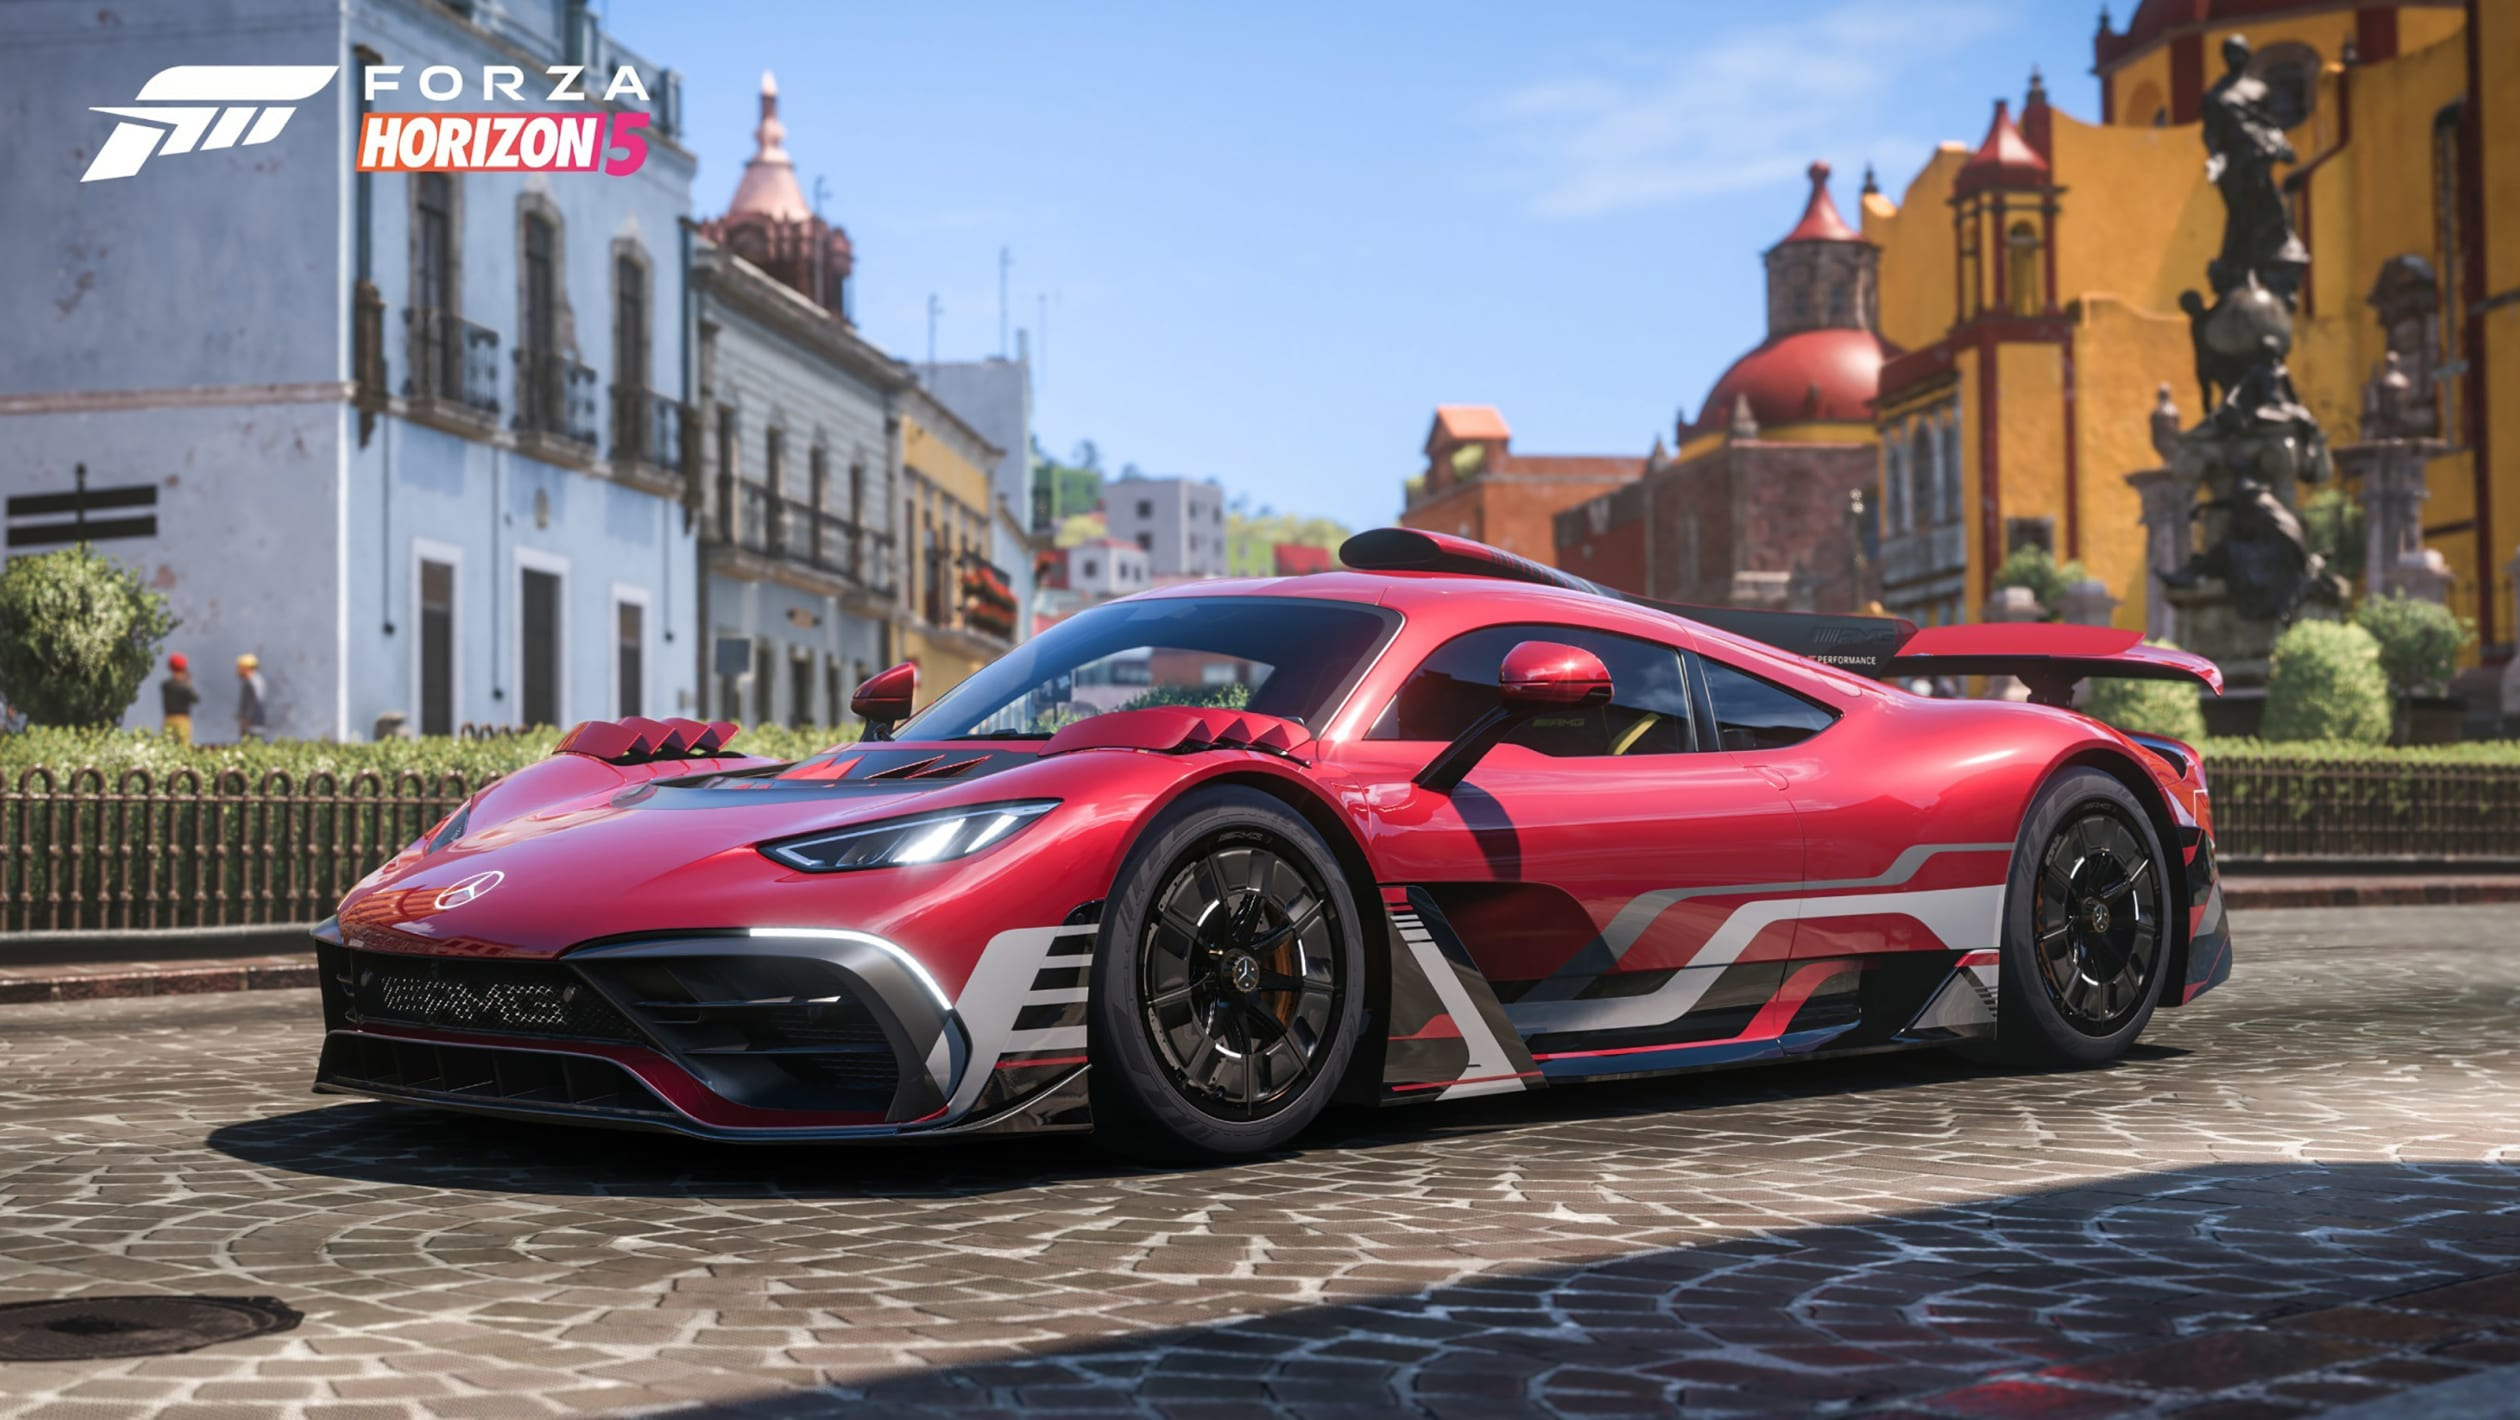 Full Map Revealed For Mexico-Based Forza Horizon 5